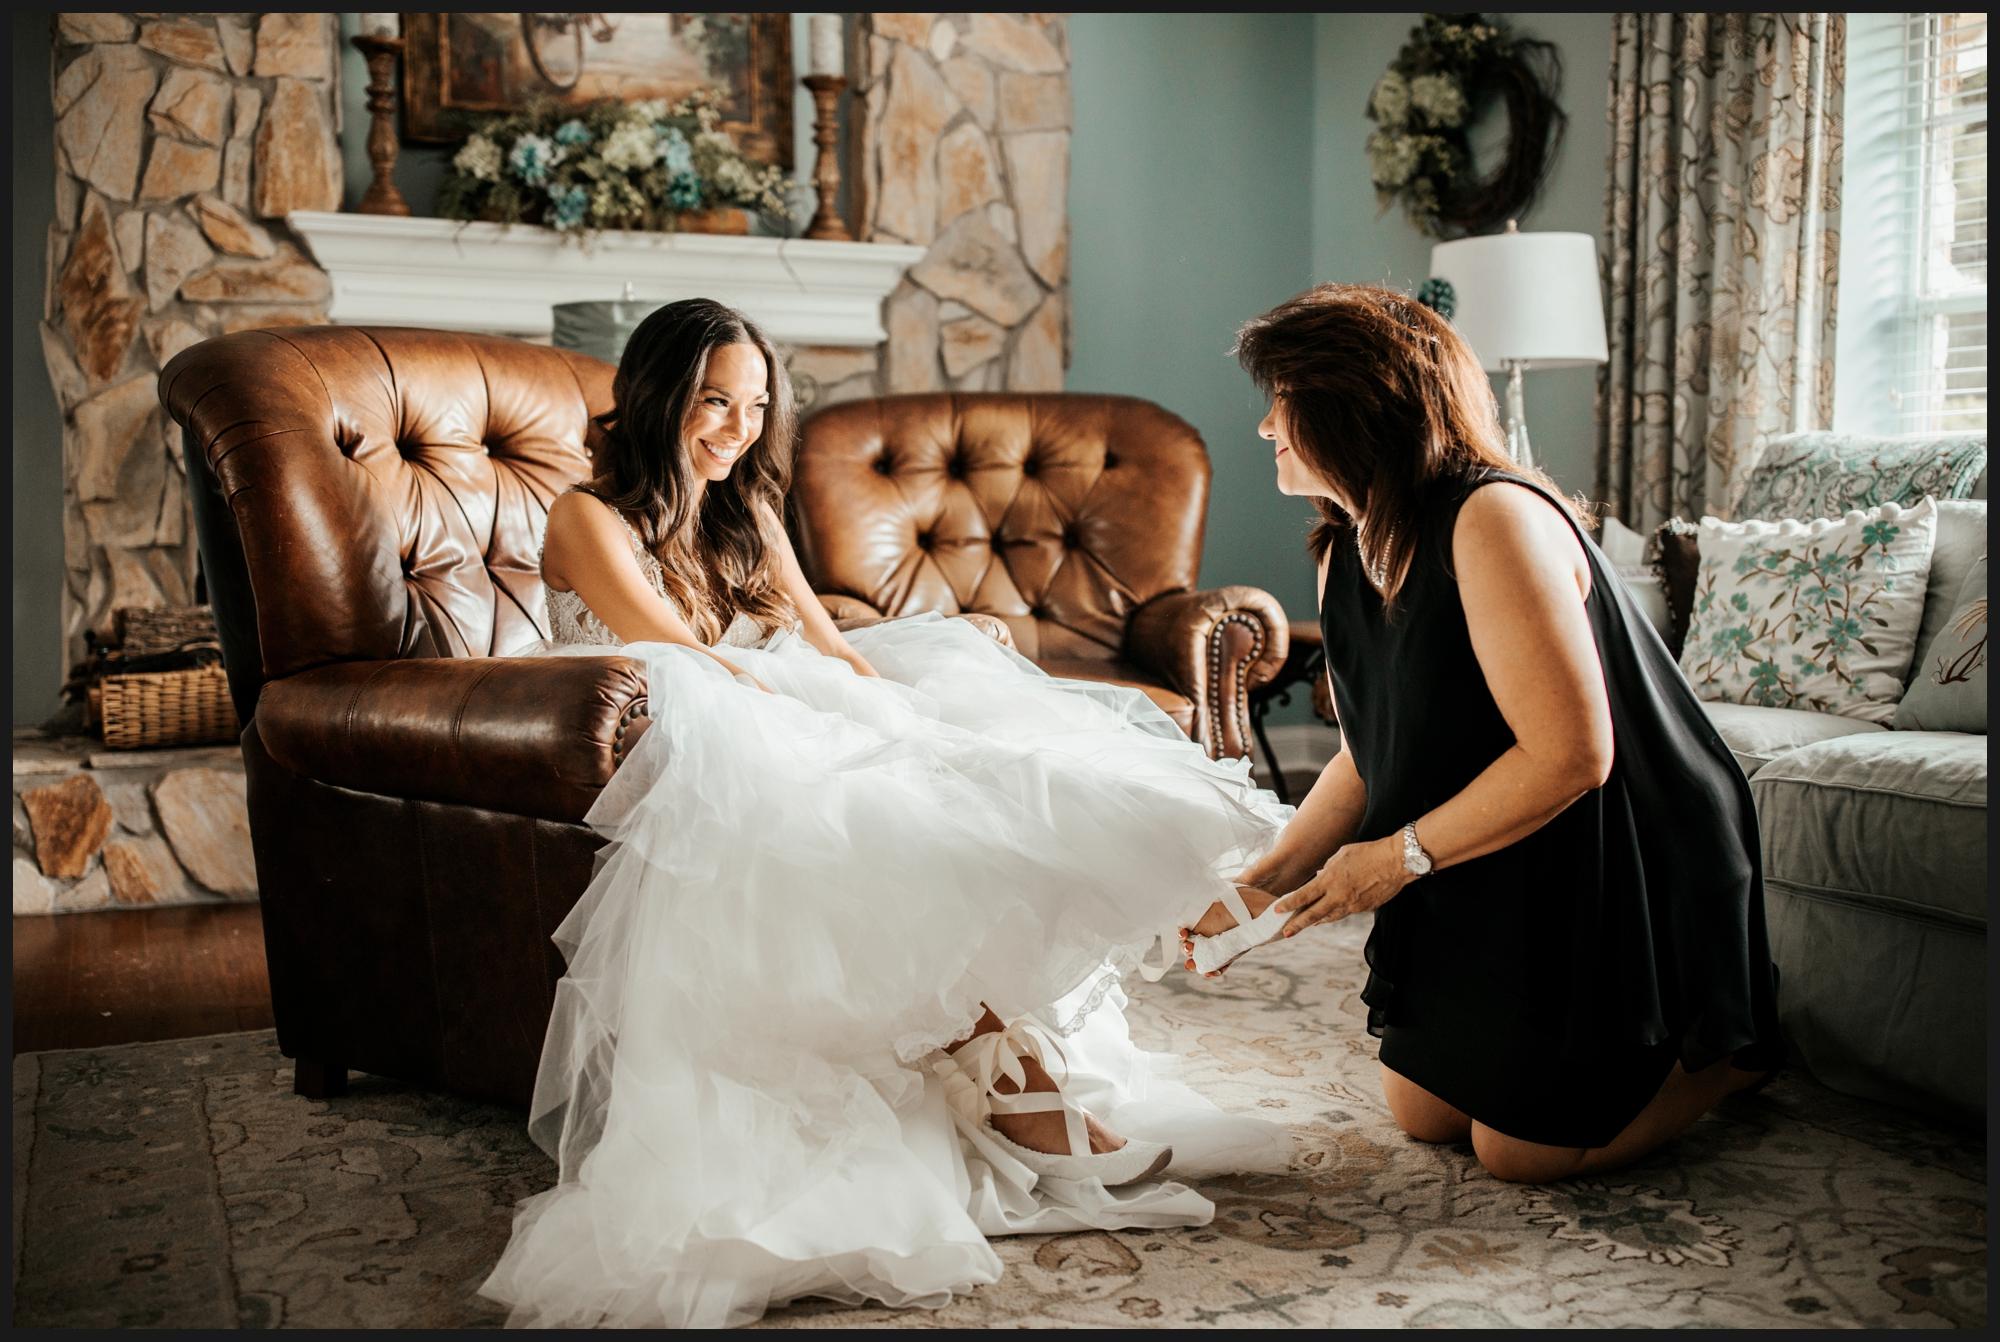 Orlando-Wedding-Photographer-destination-wedding-photographer-florida-wedding-photographer-bohemian-wedding-photographer_1582.jpg